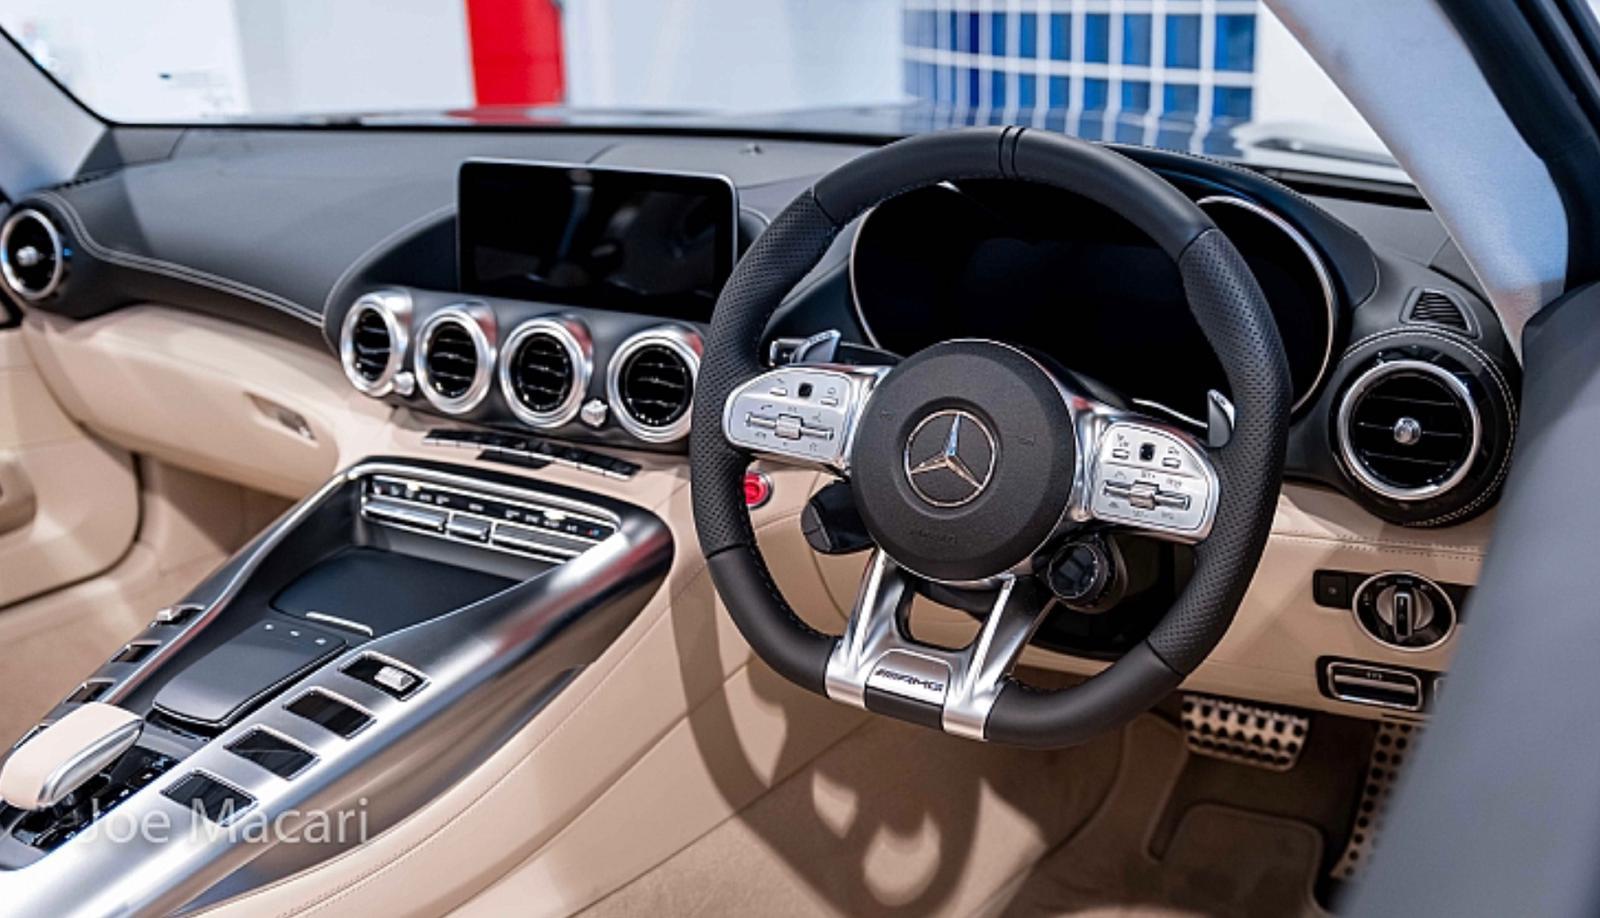 AMG GTS dash and steering wheel